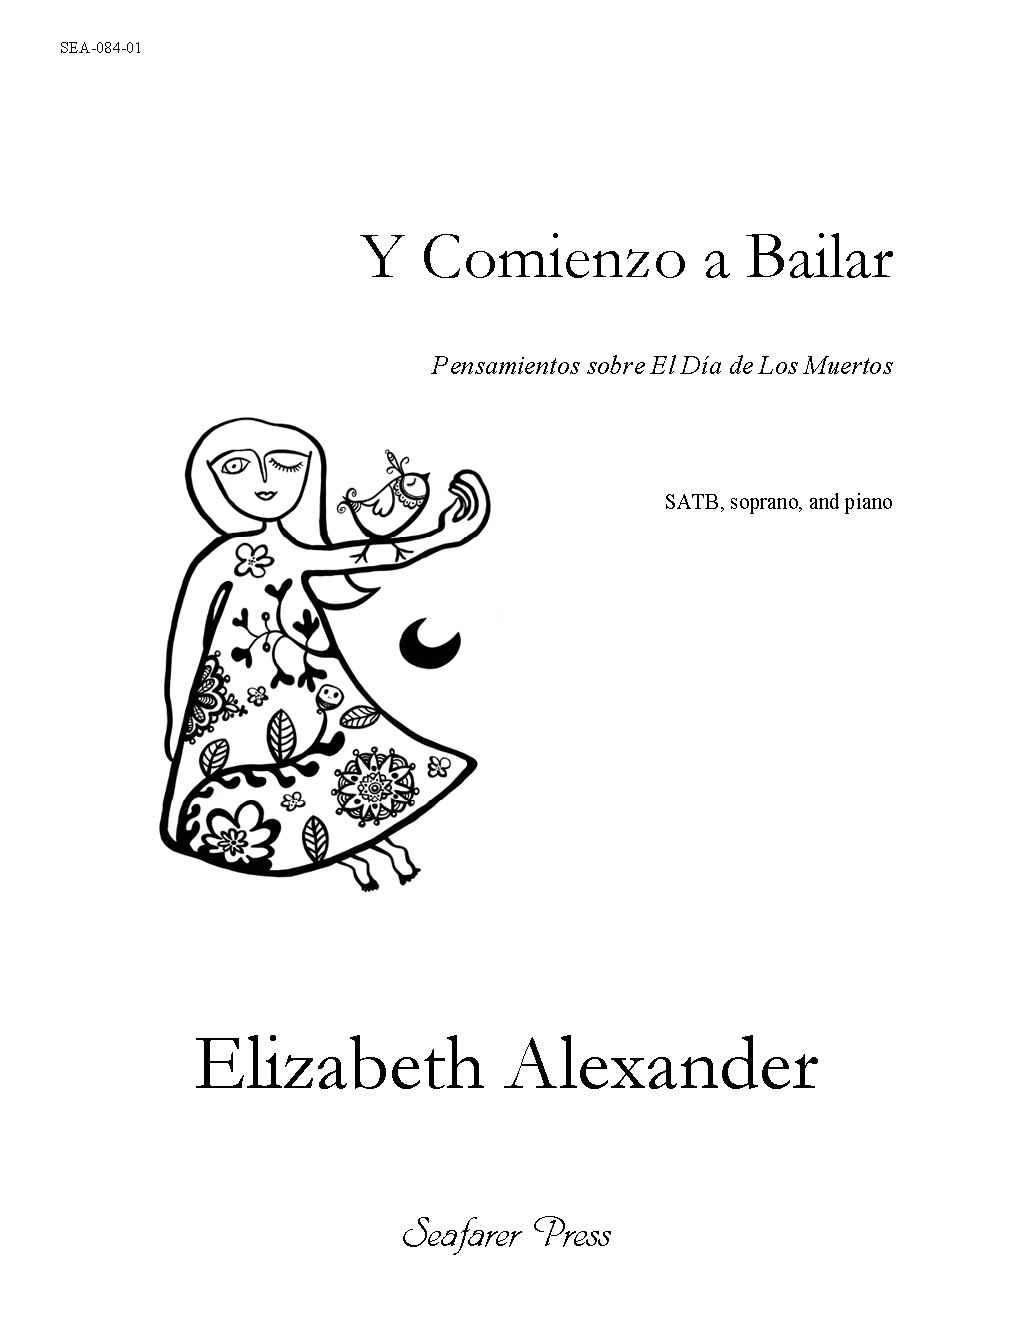 "SEA-084-01 - Y Comienzo a Bailar (""And I Begin To Dance"")"